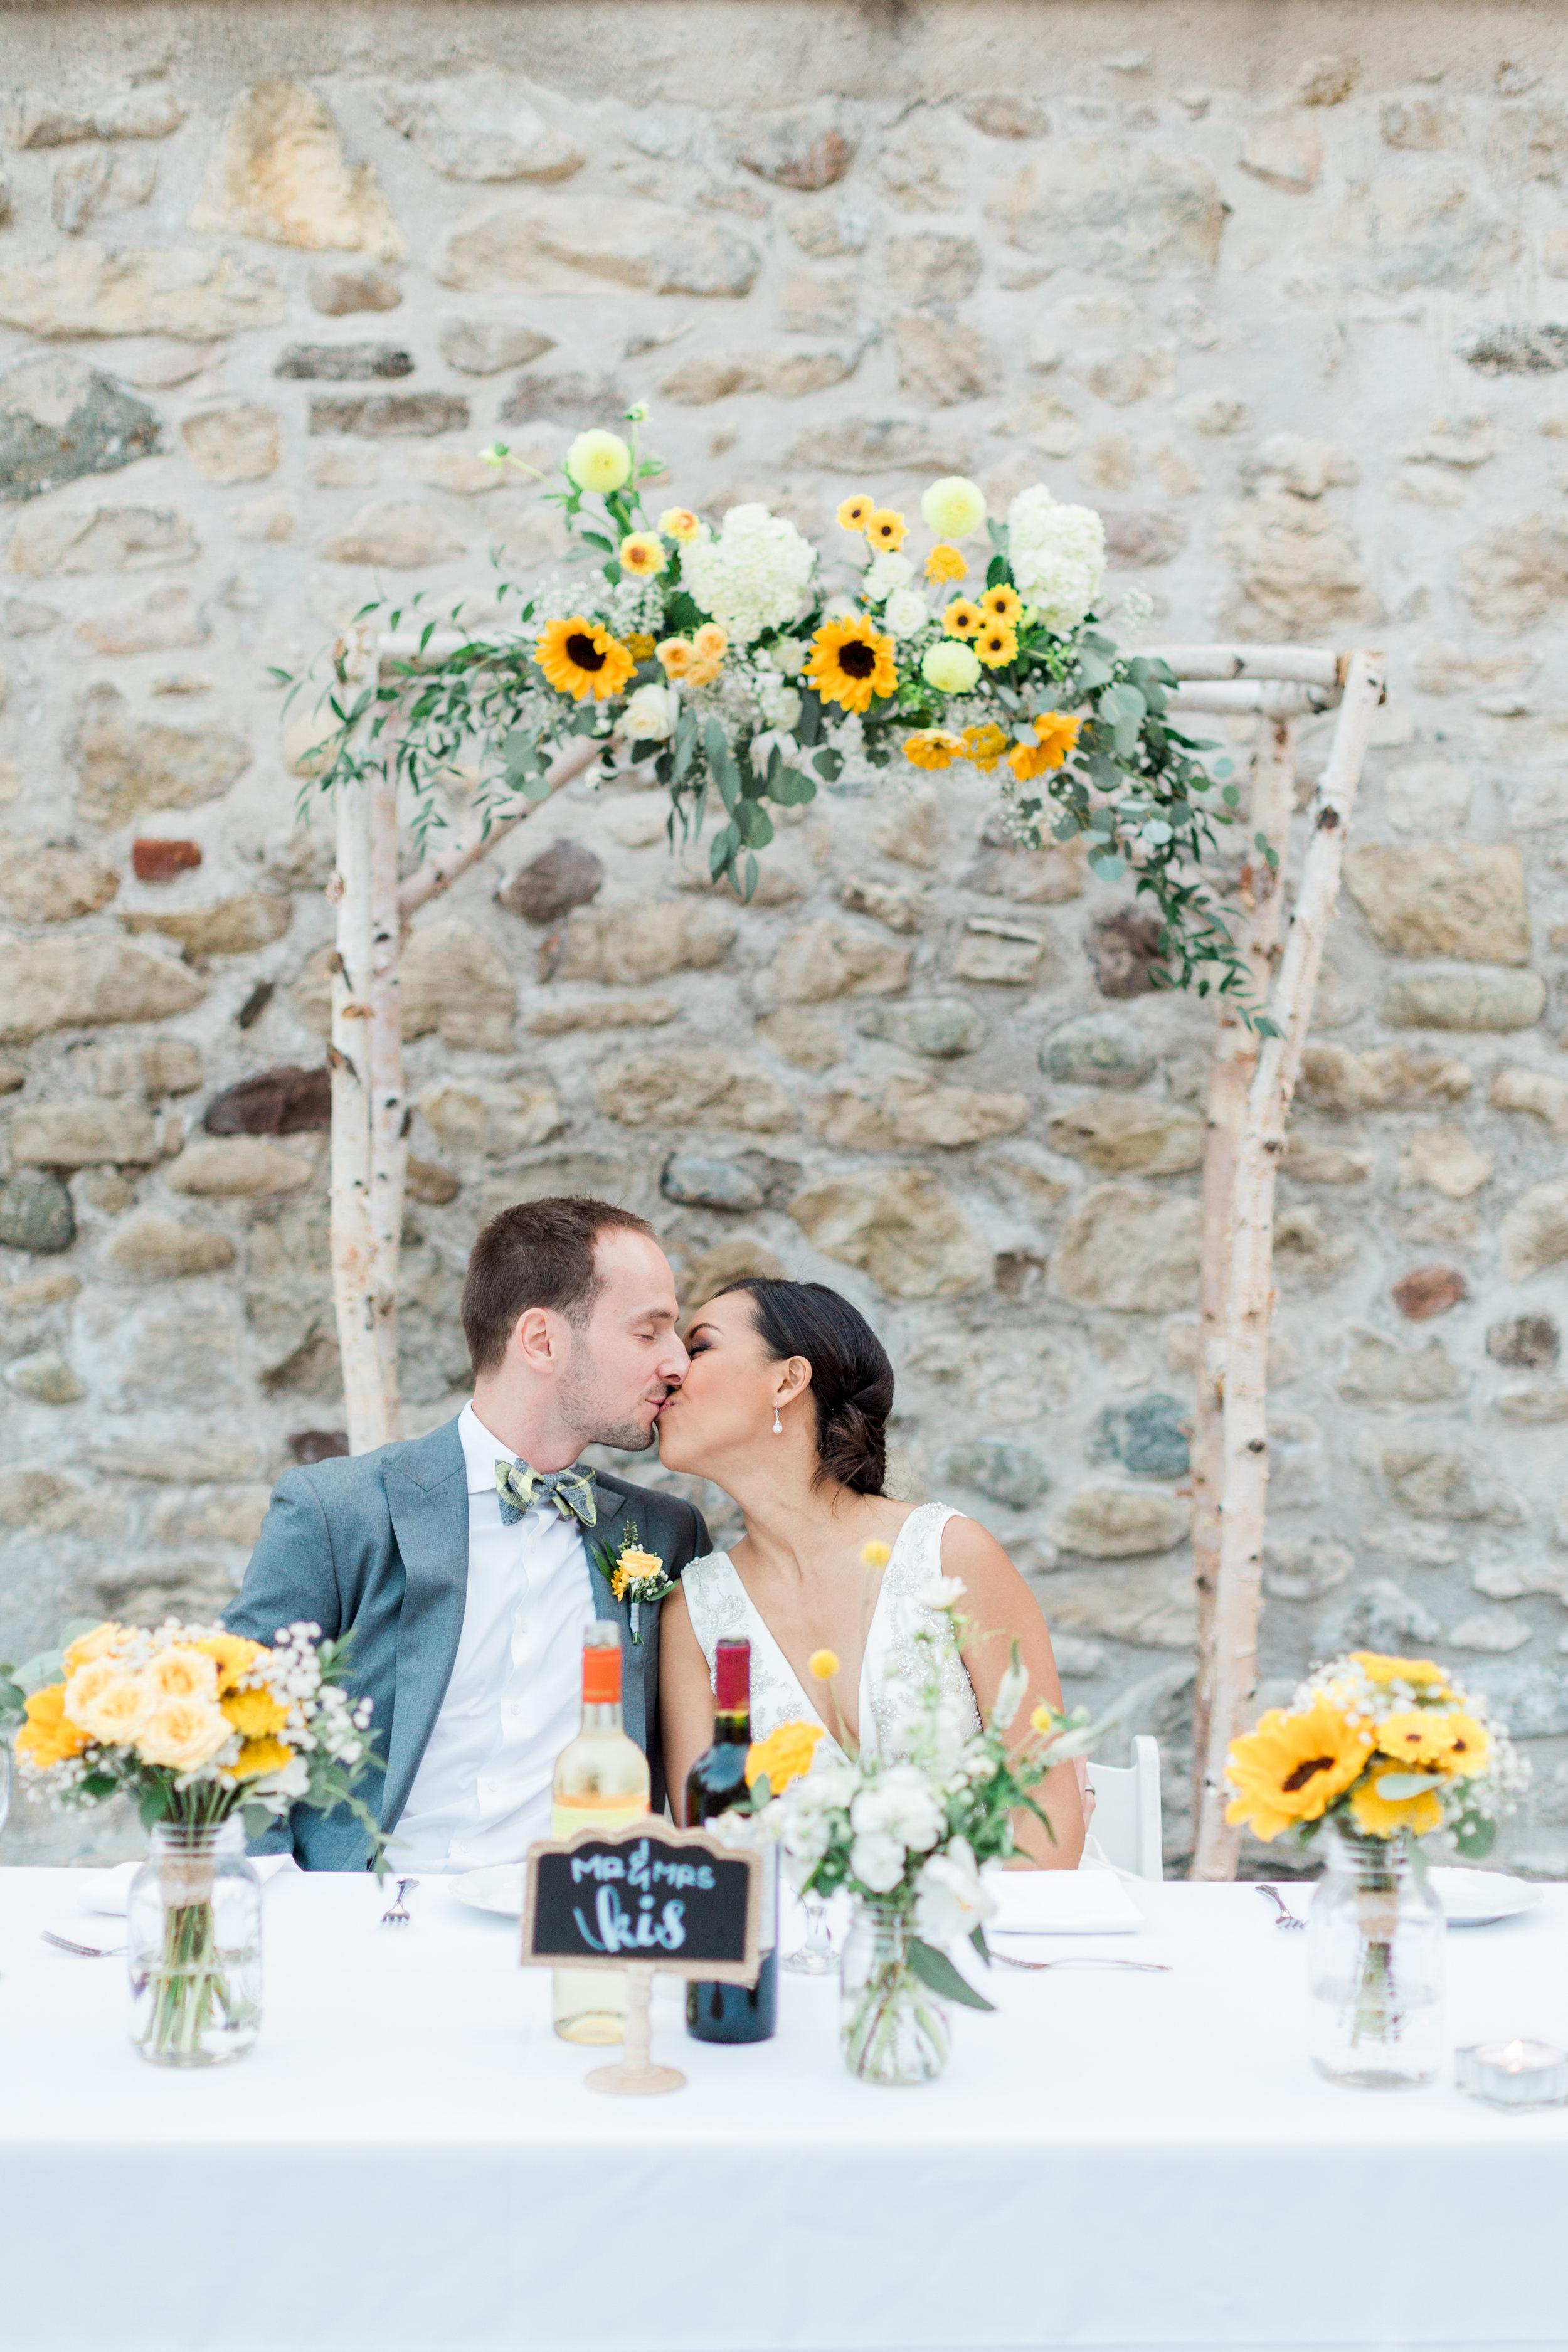 Alton Mills Wedding - Reception-40.jpg